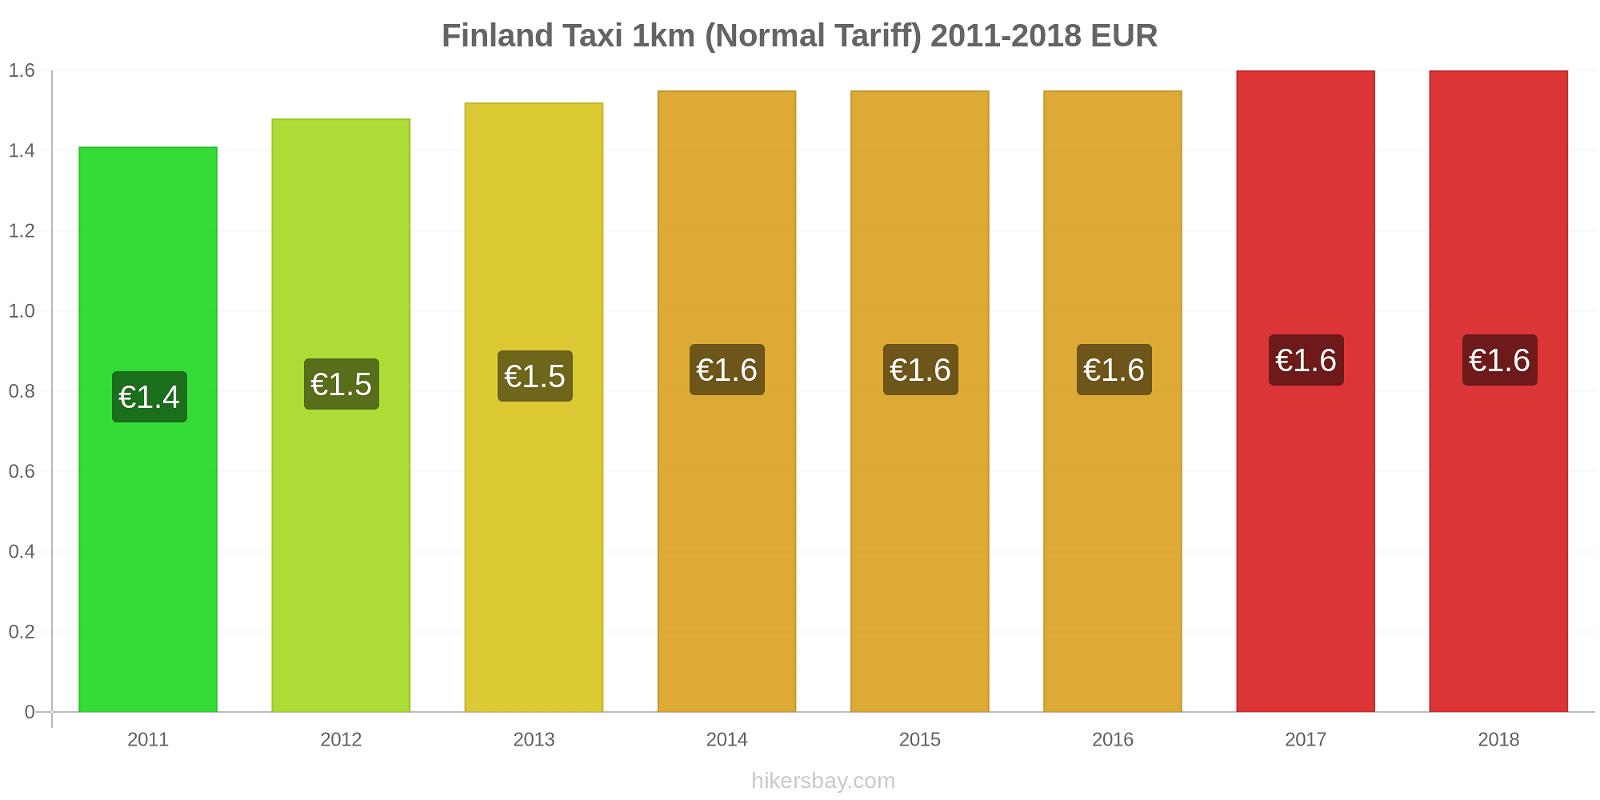 Finland price changes Taxi 1km (Normal Tariff) hikersbay.com